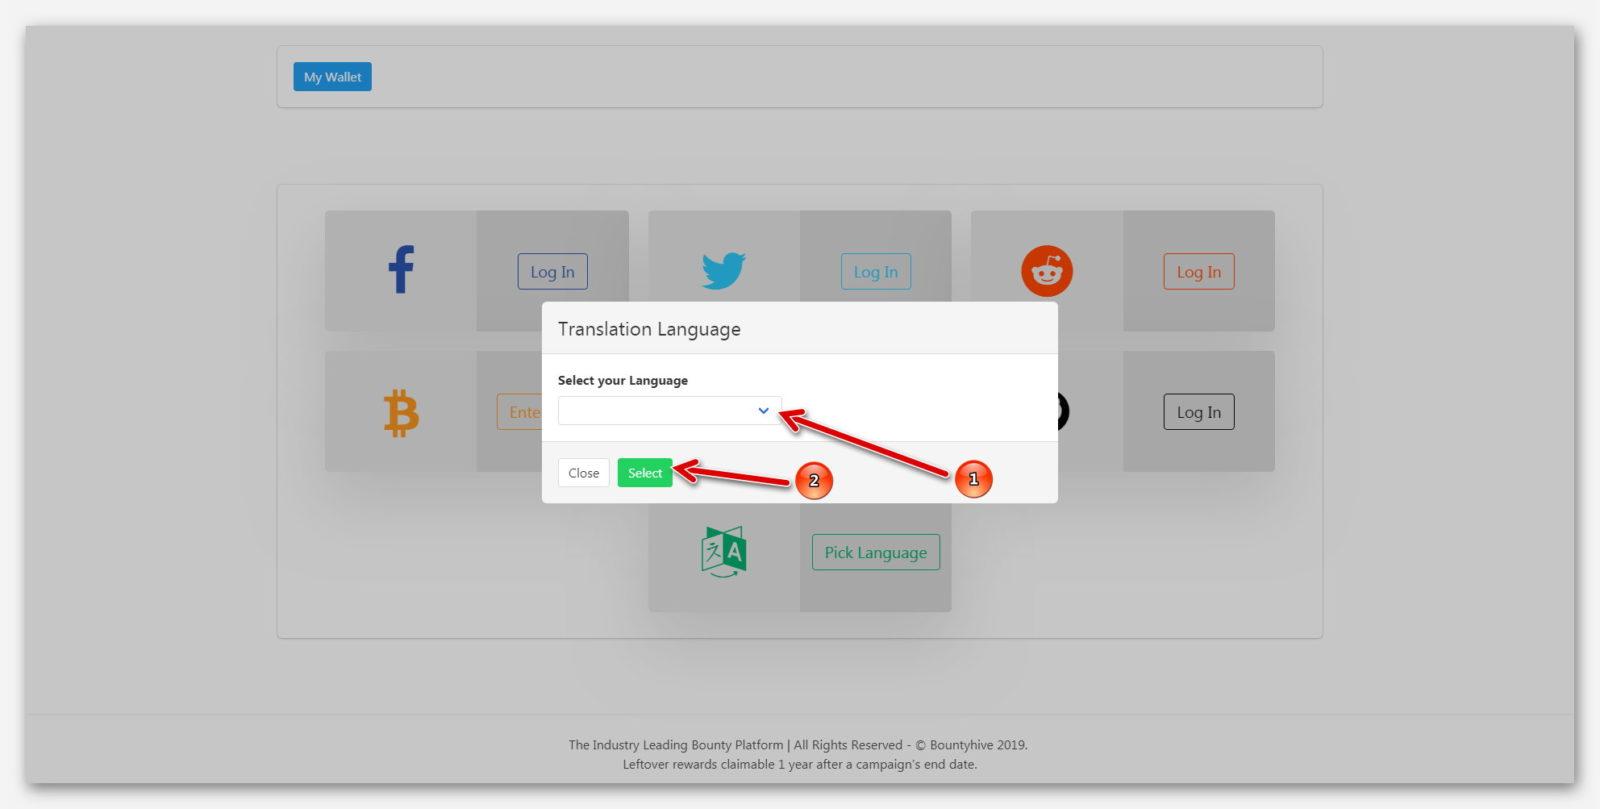 Раздел для выбора языка, на платформе BountyHive